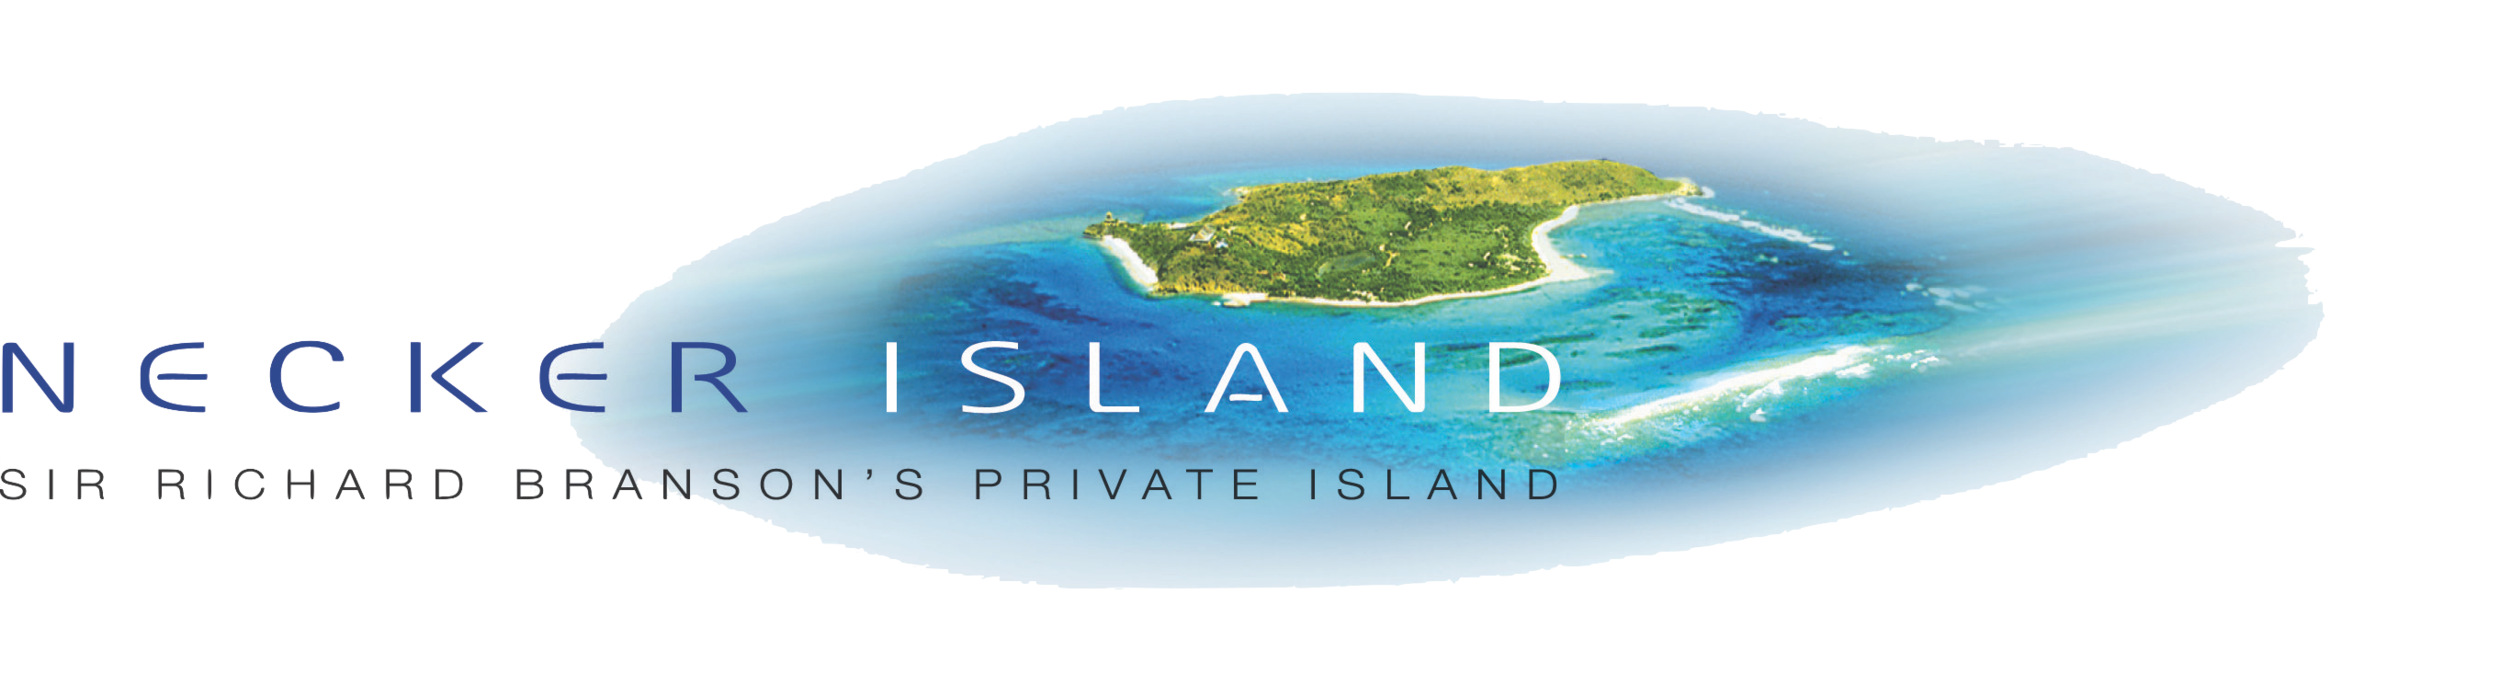 necker island logo 1.png